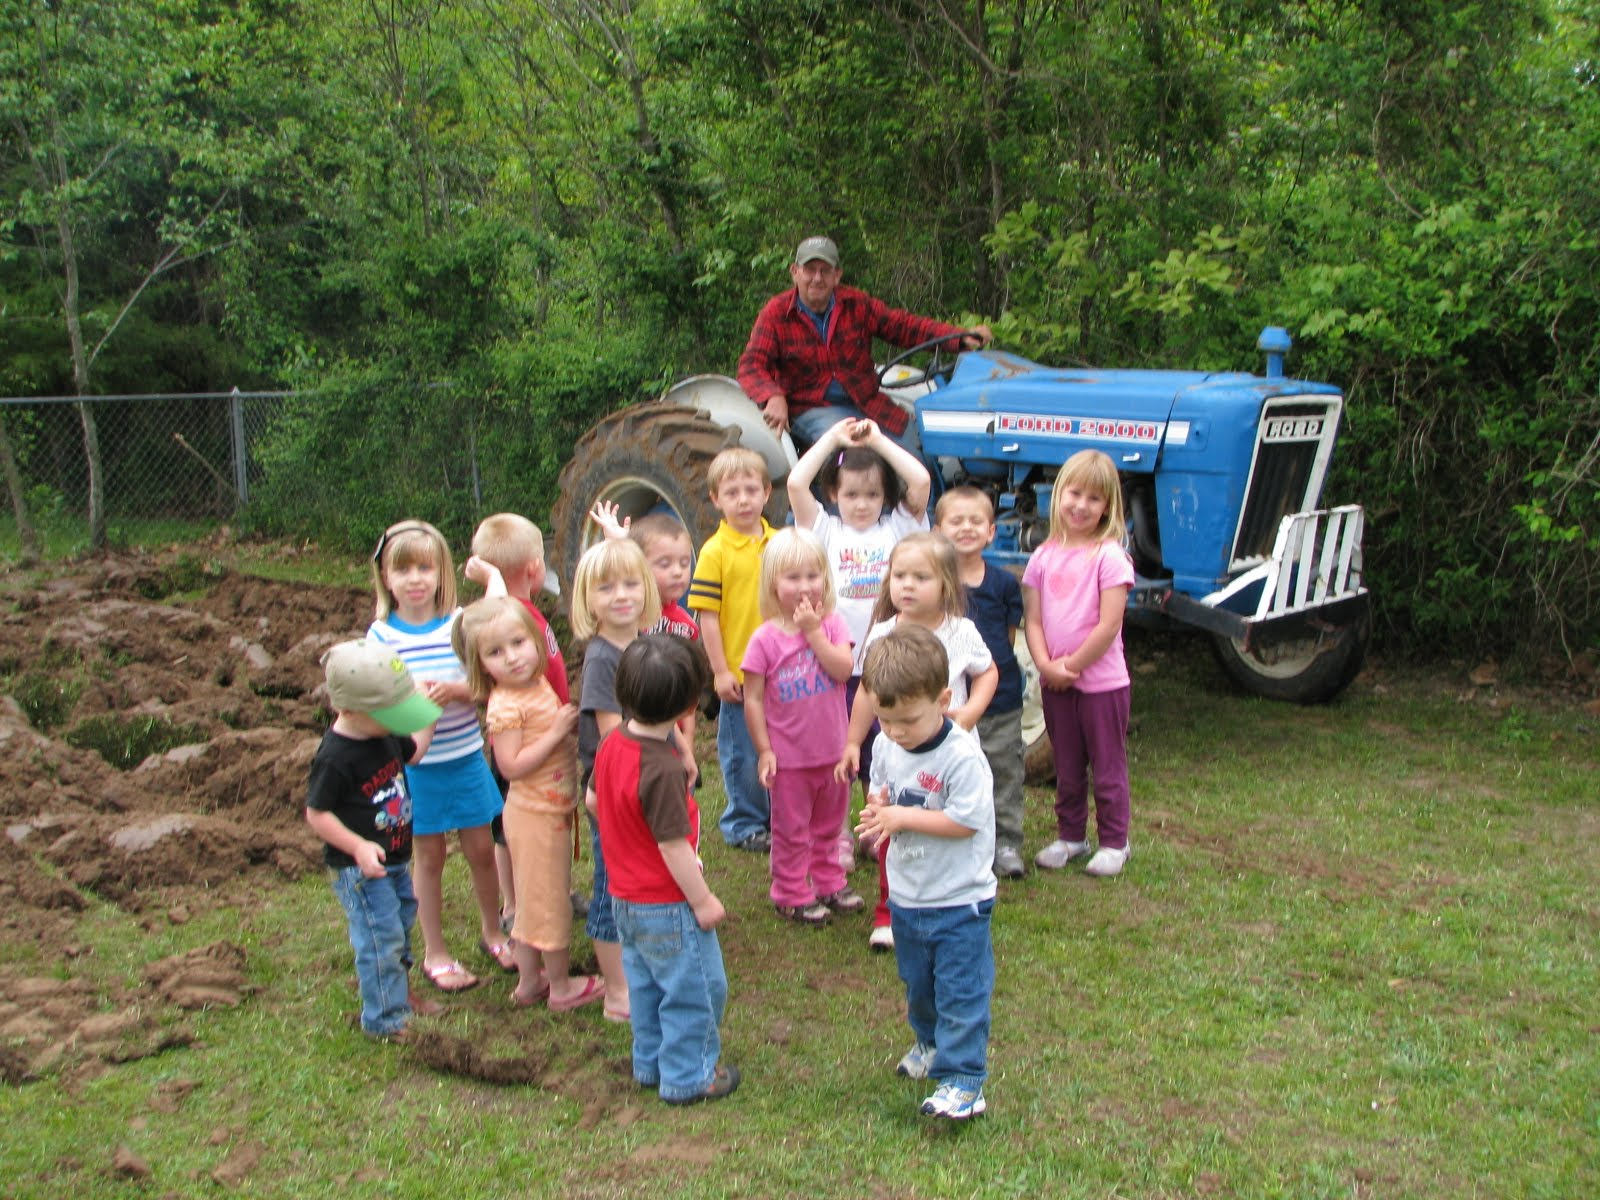 Giggles Amp Grins Preschool April